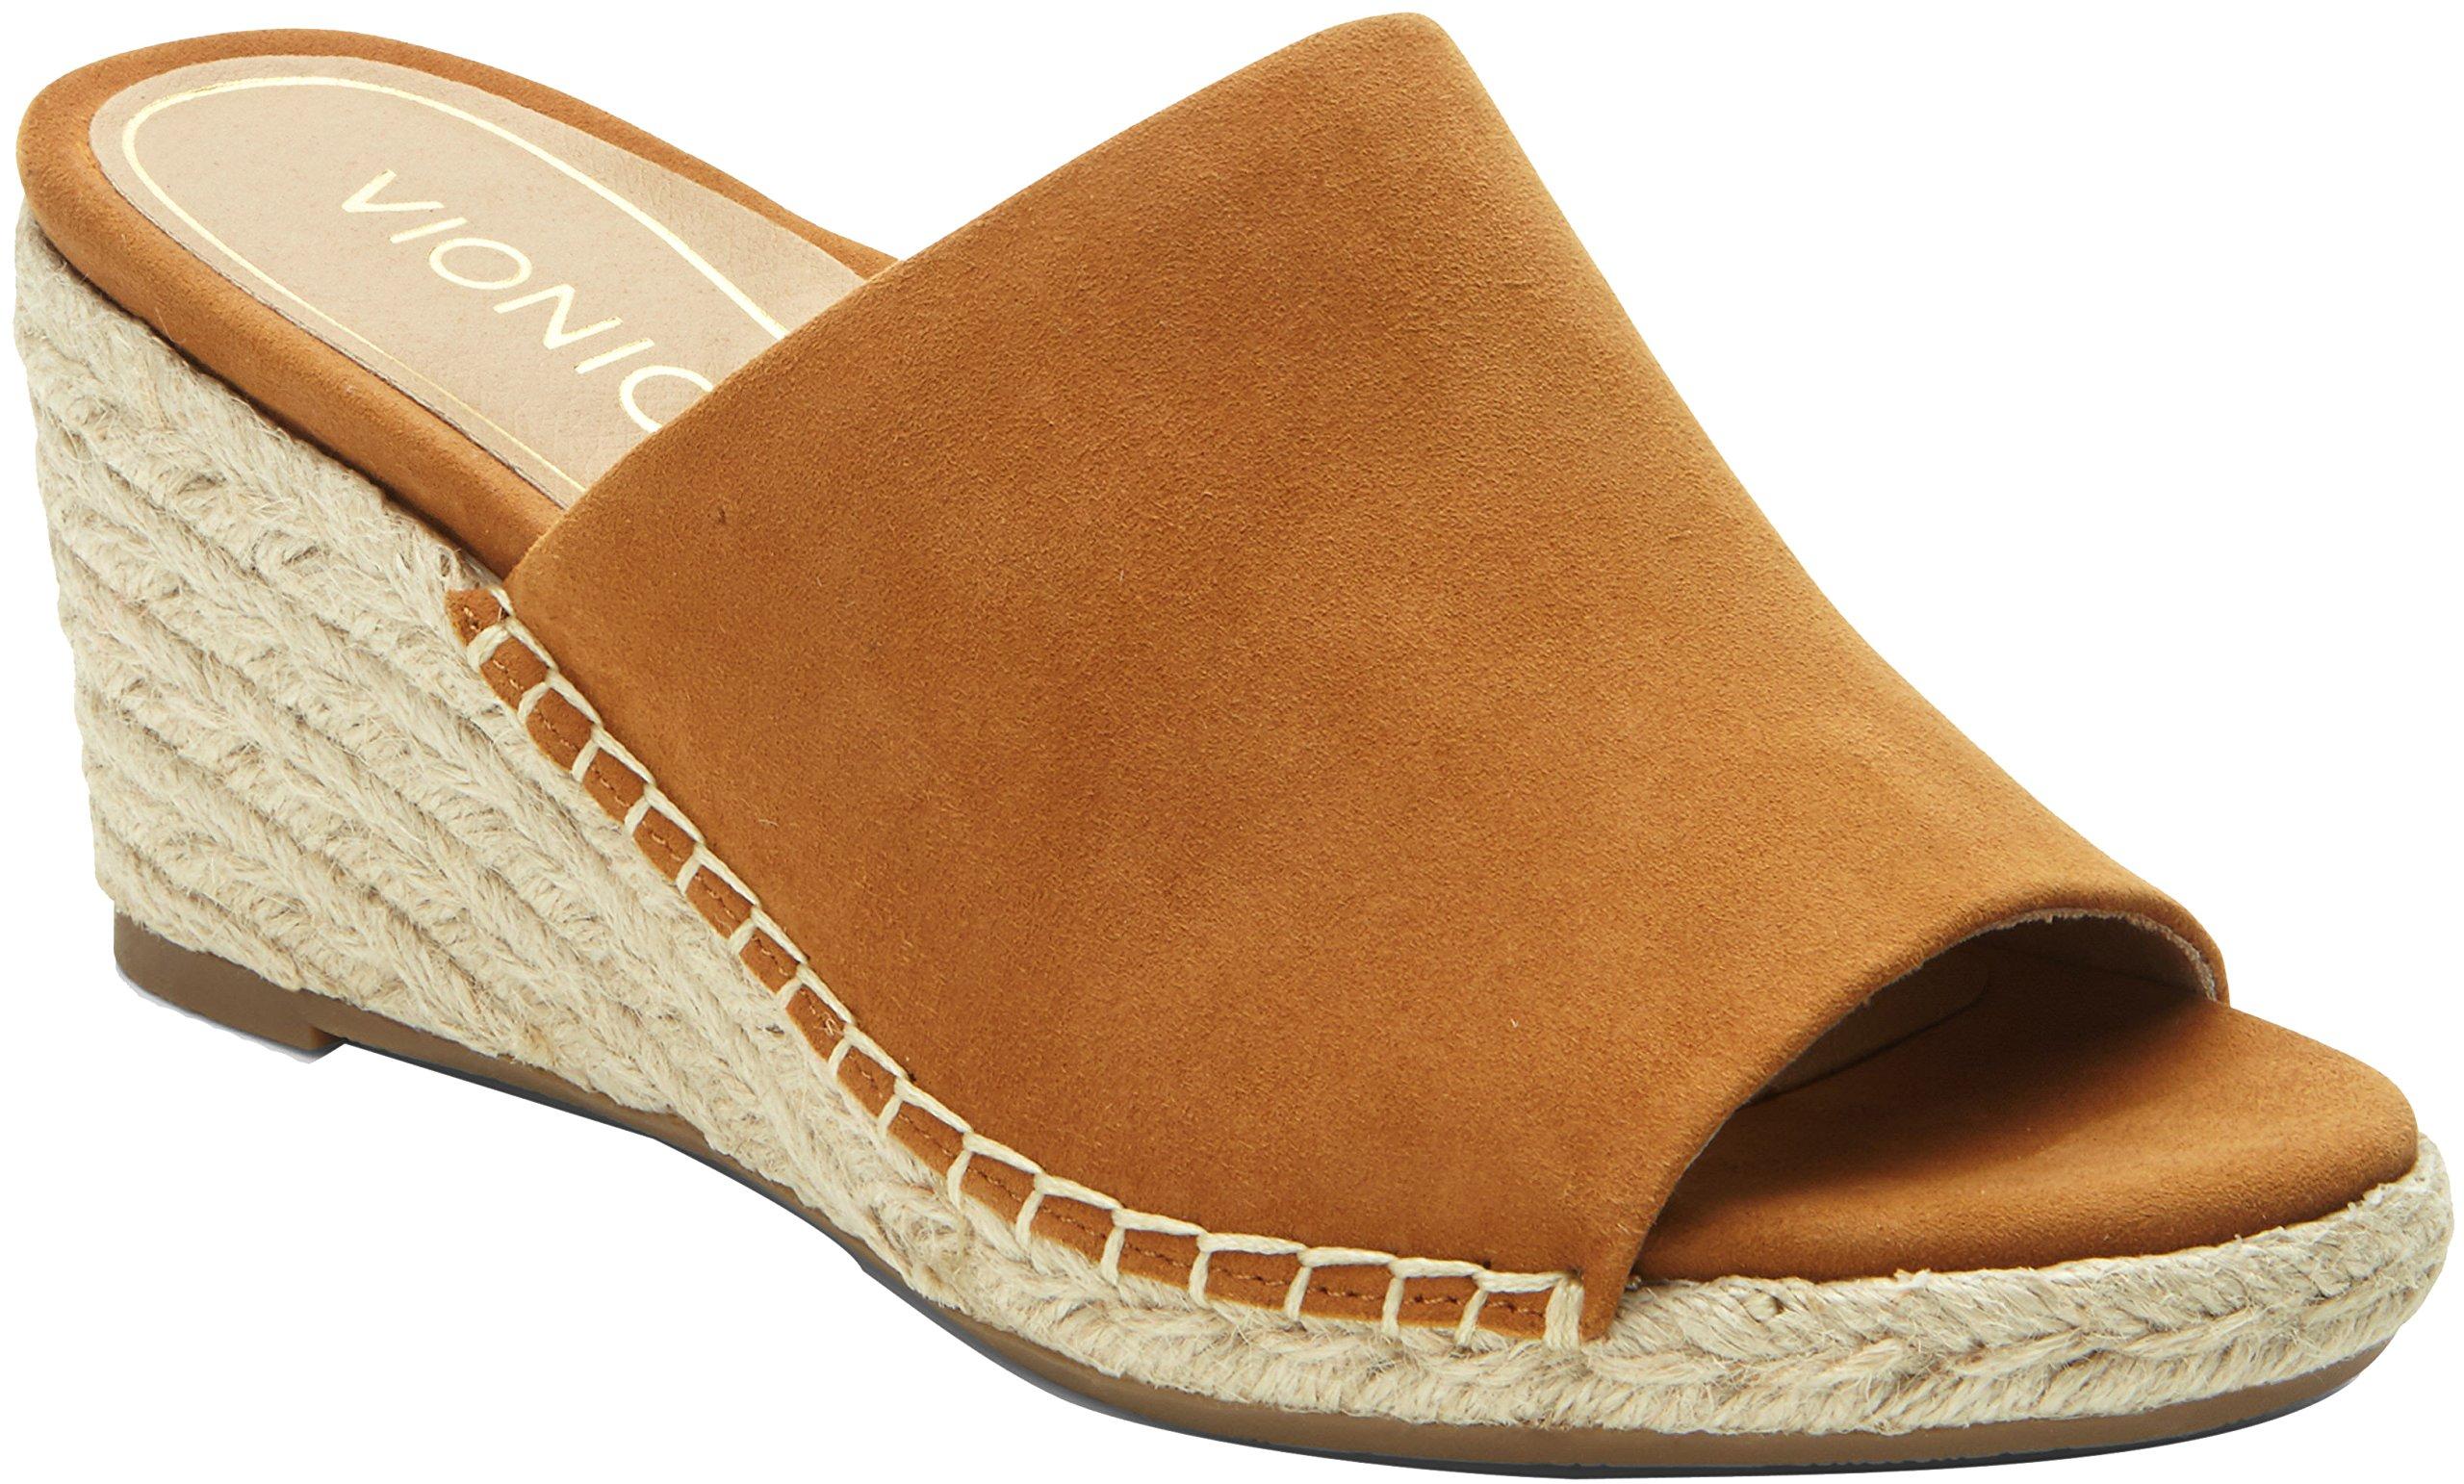 Vionic Tulum Kadyn - Womens Wedge Slip-On Sandal Caramel - 8 Wide